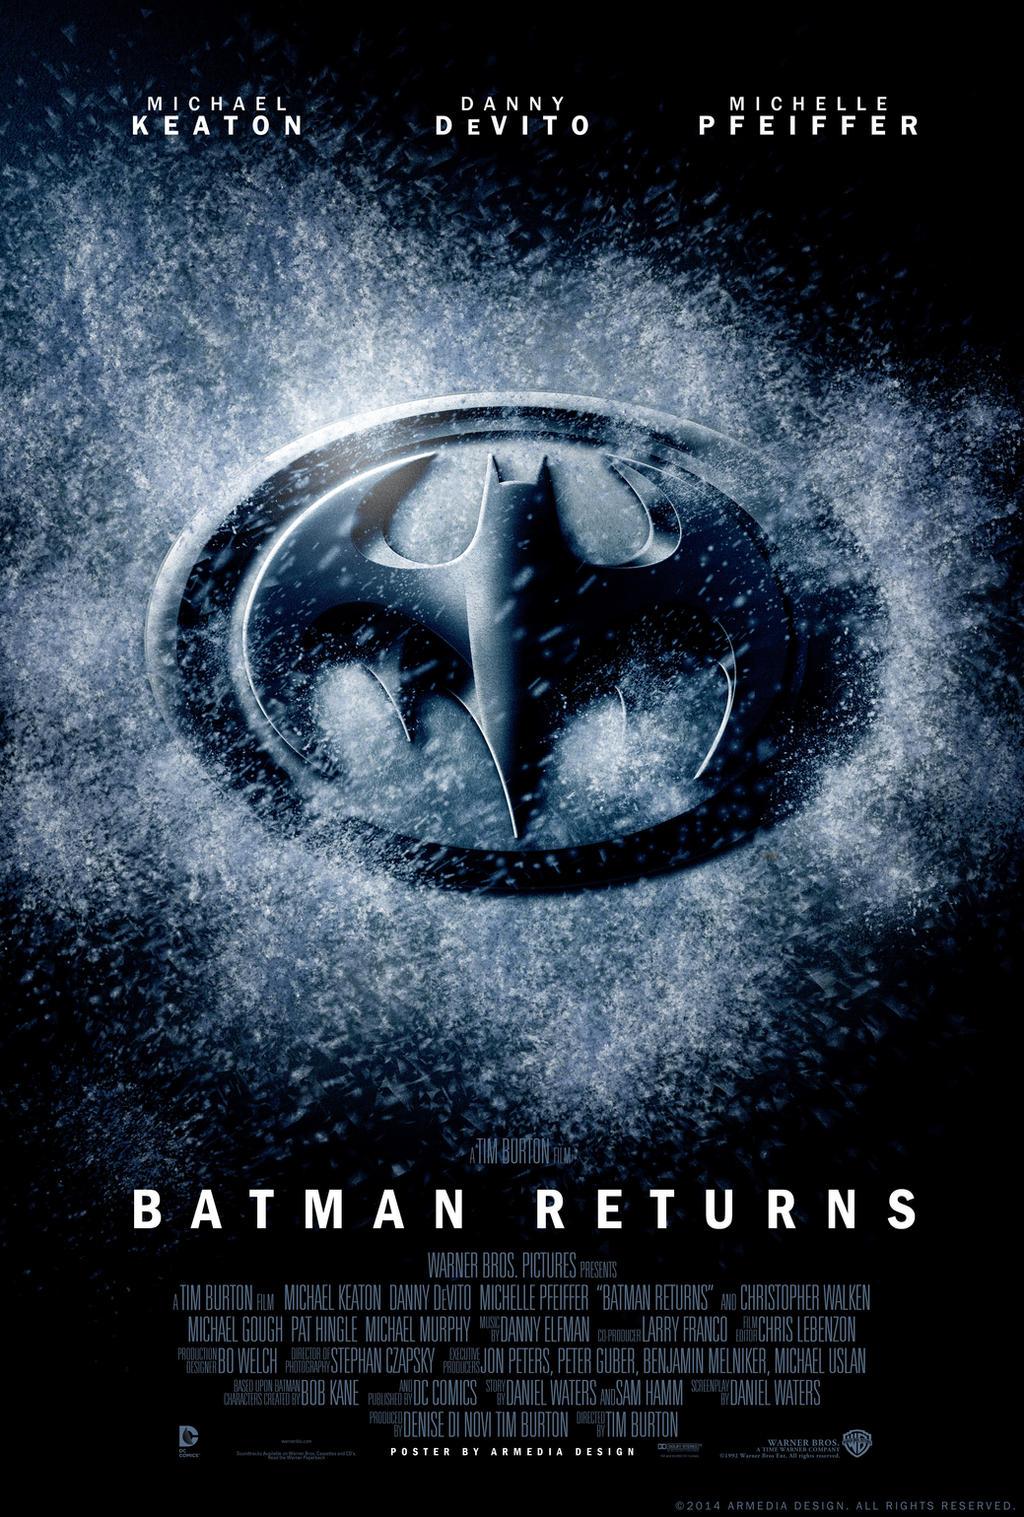 Batman returns movie poster